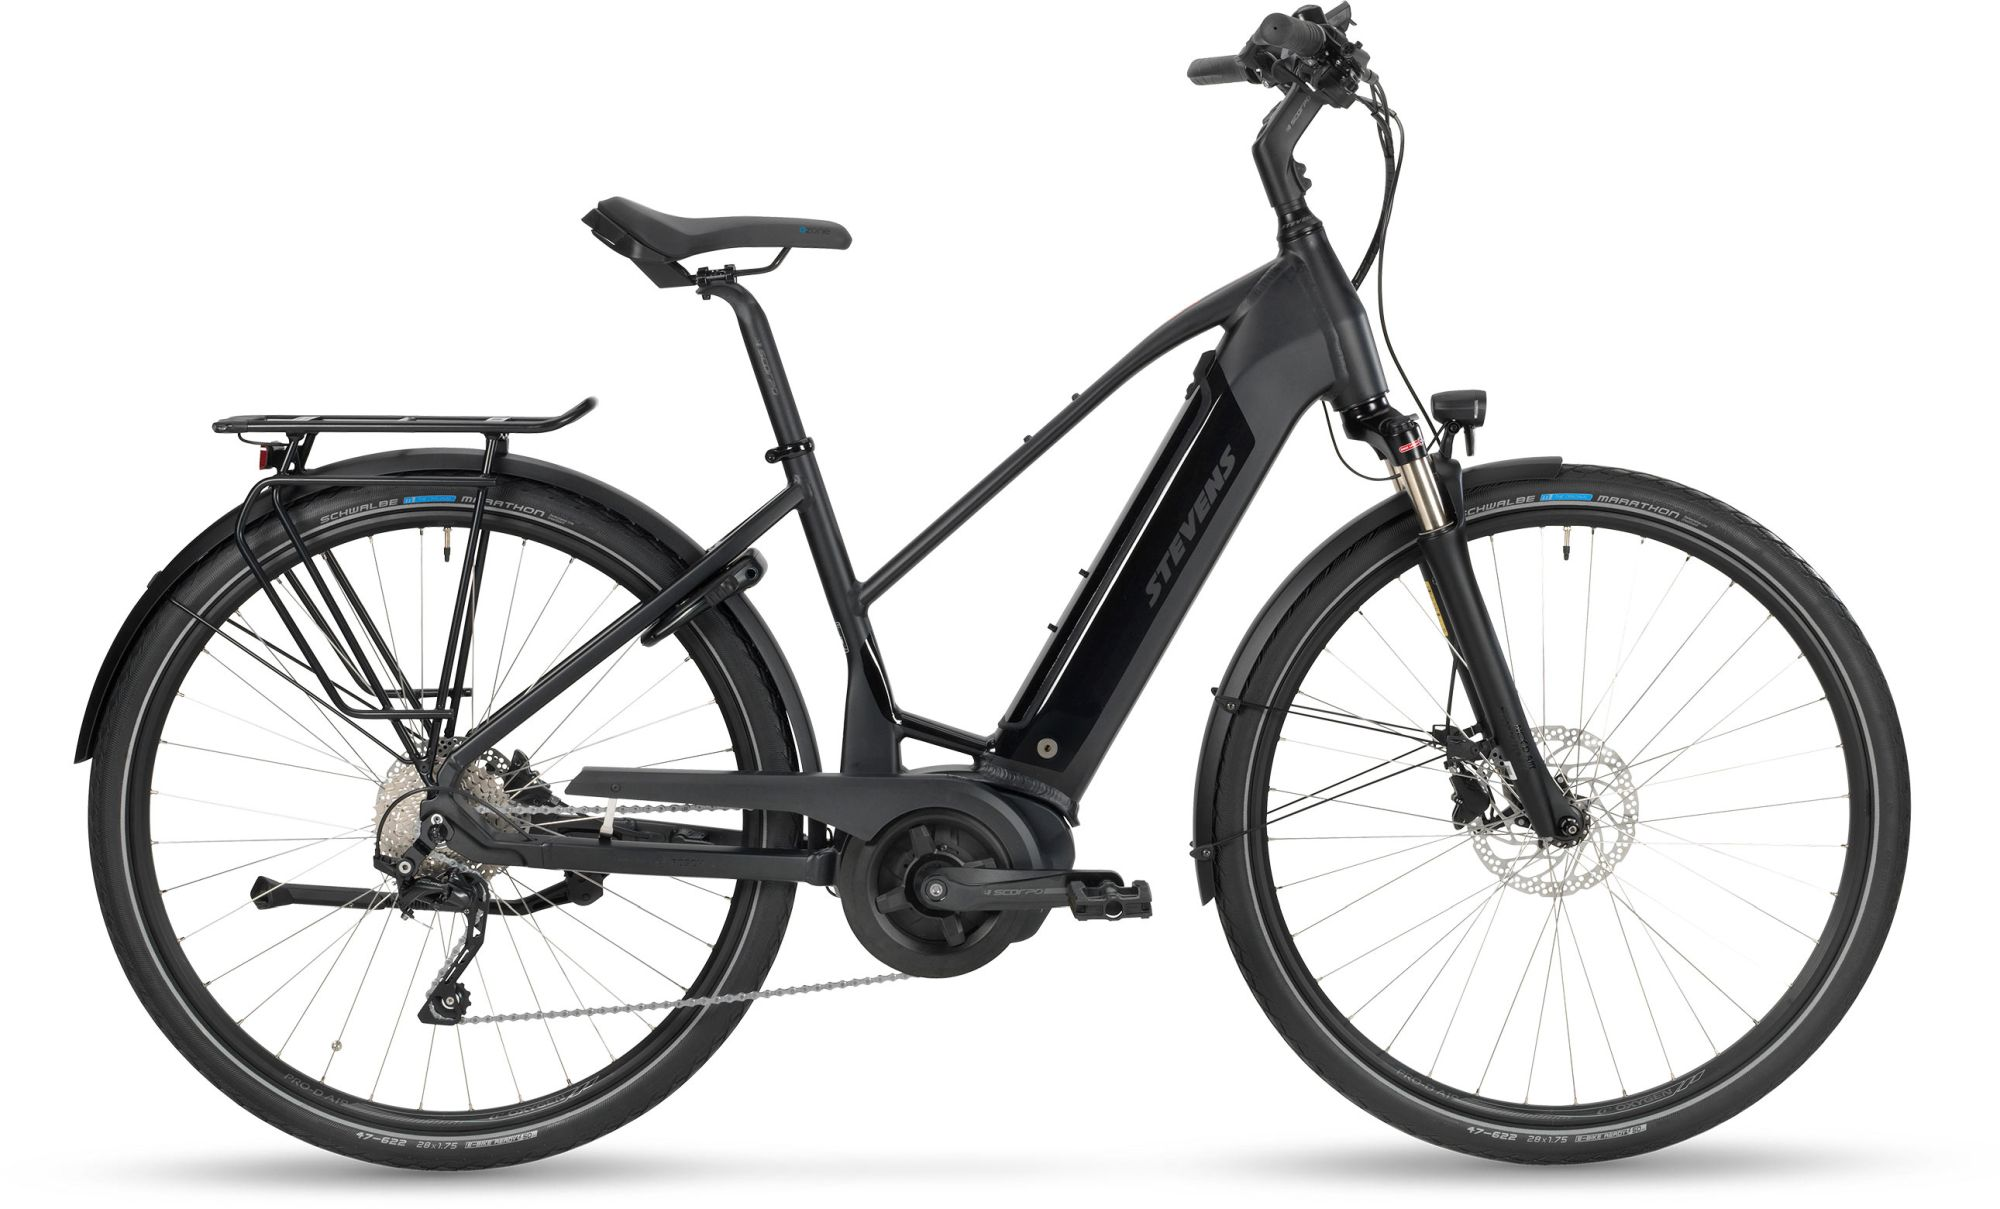 E-Bikes: STEVENS  E-Lavena PT5 Damenfahrrad Trapez Modell 2020 28 Zoll 50 cm